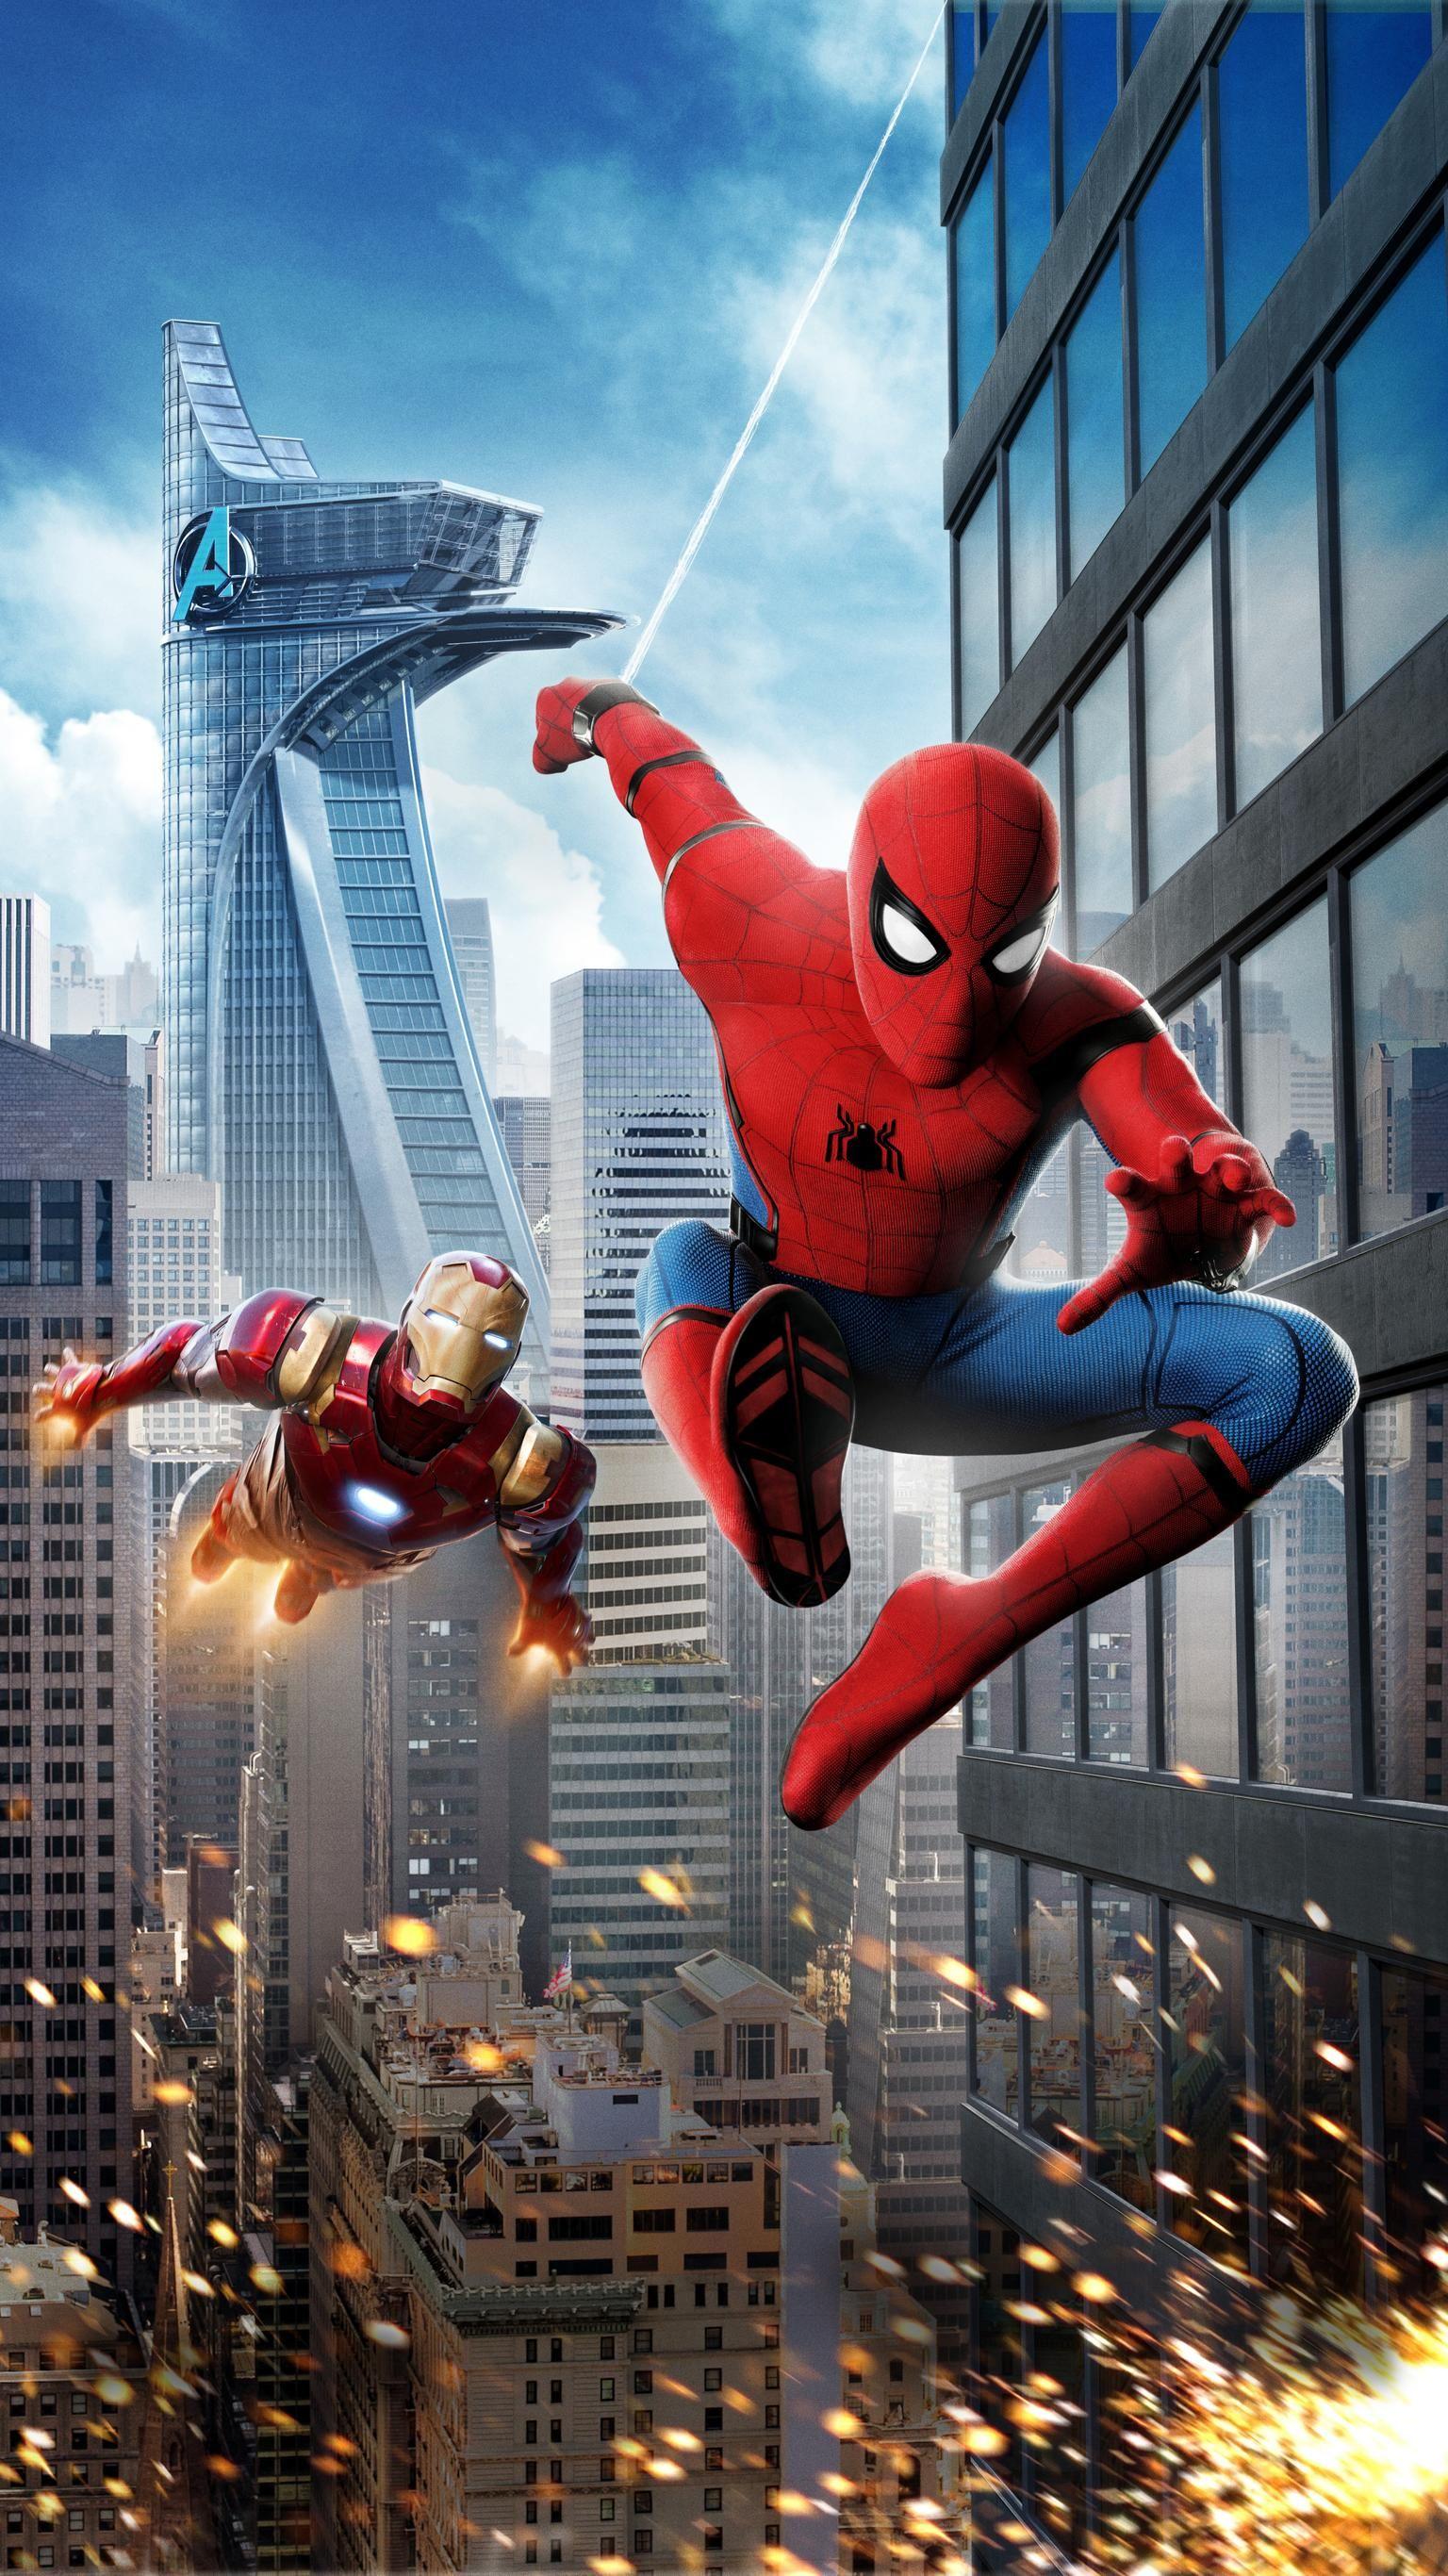 Spider Man Homecoming 2017 Phone Wallpaper Wallpapers